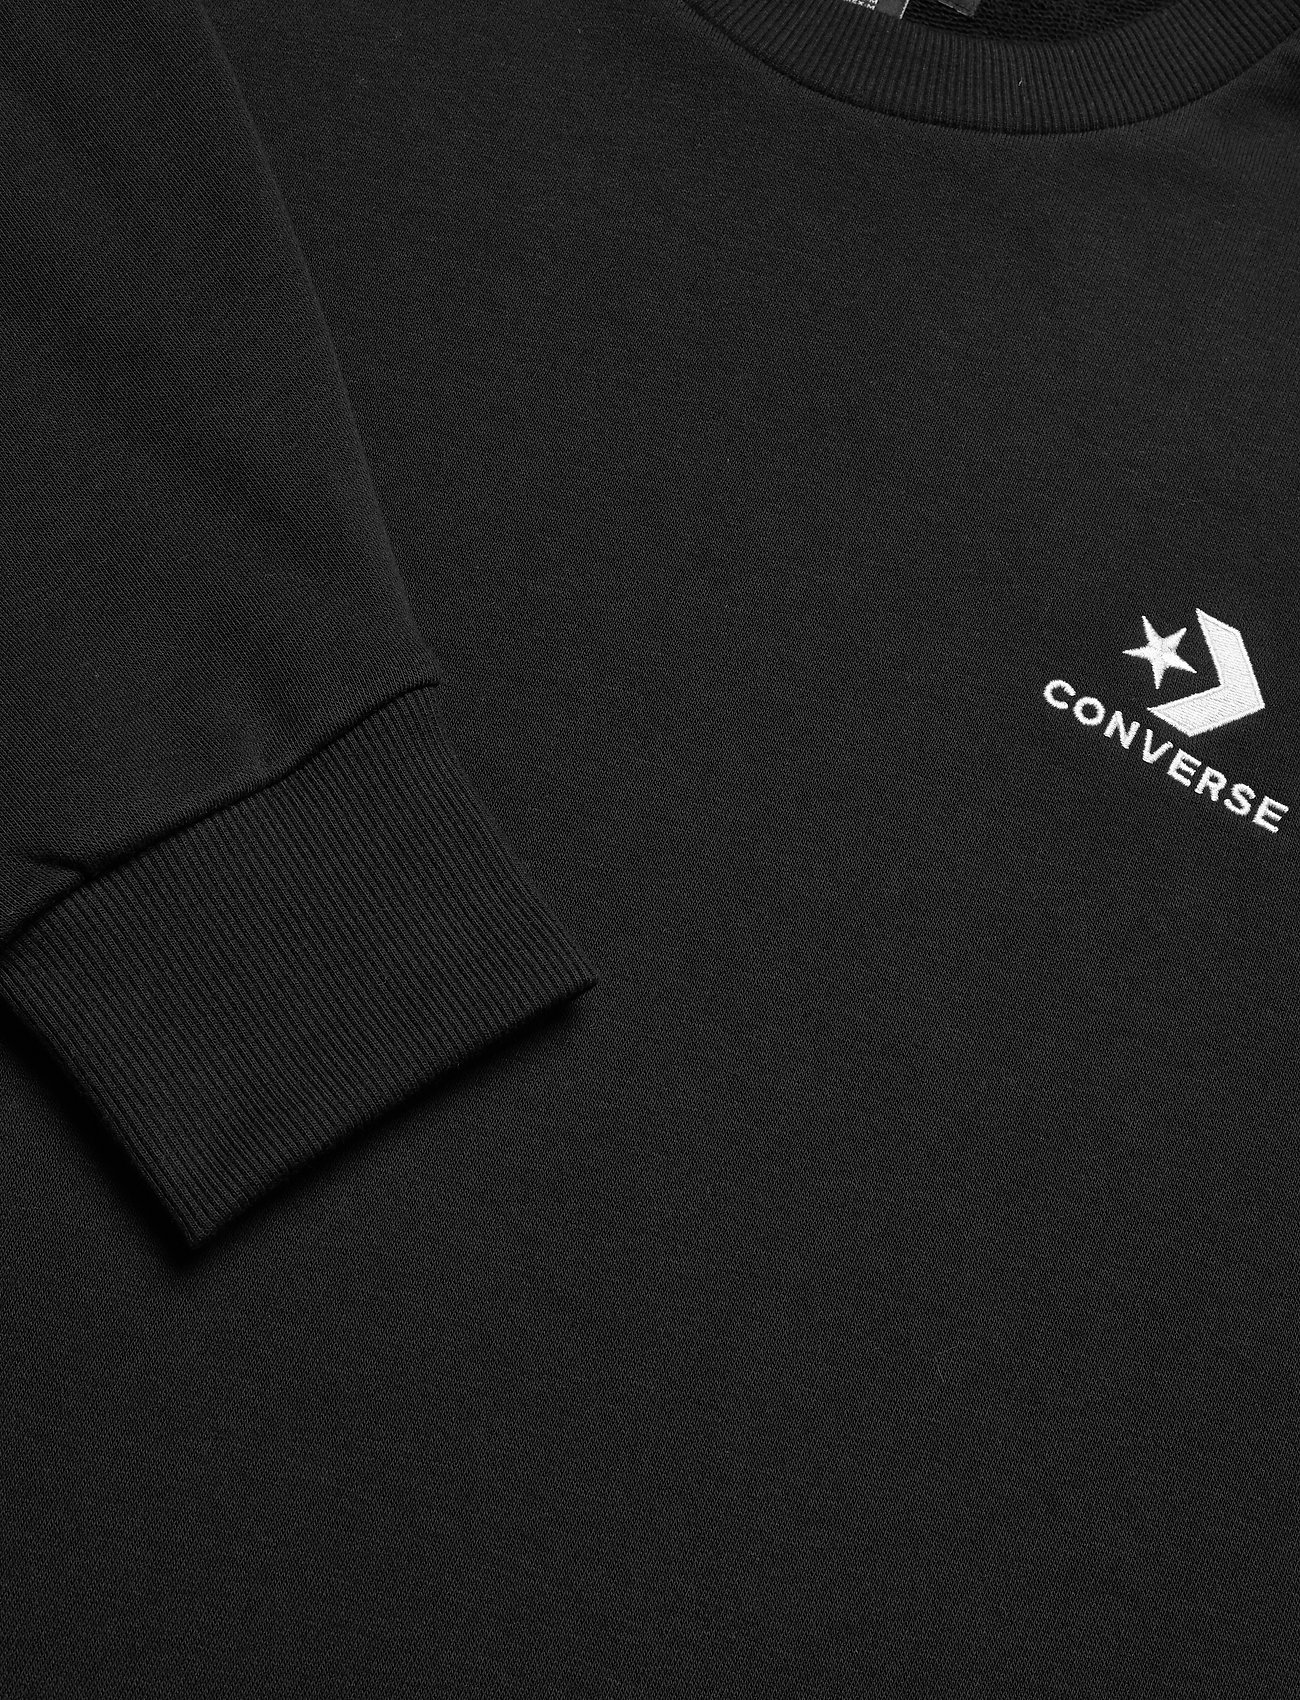 Converse Star Chevron Emb Crew Ft Black - Sweatshirts